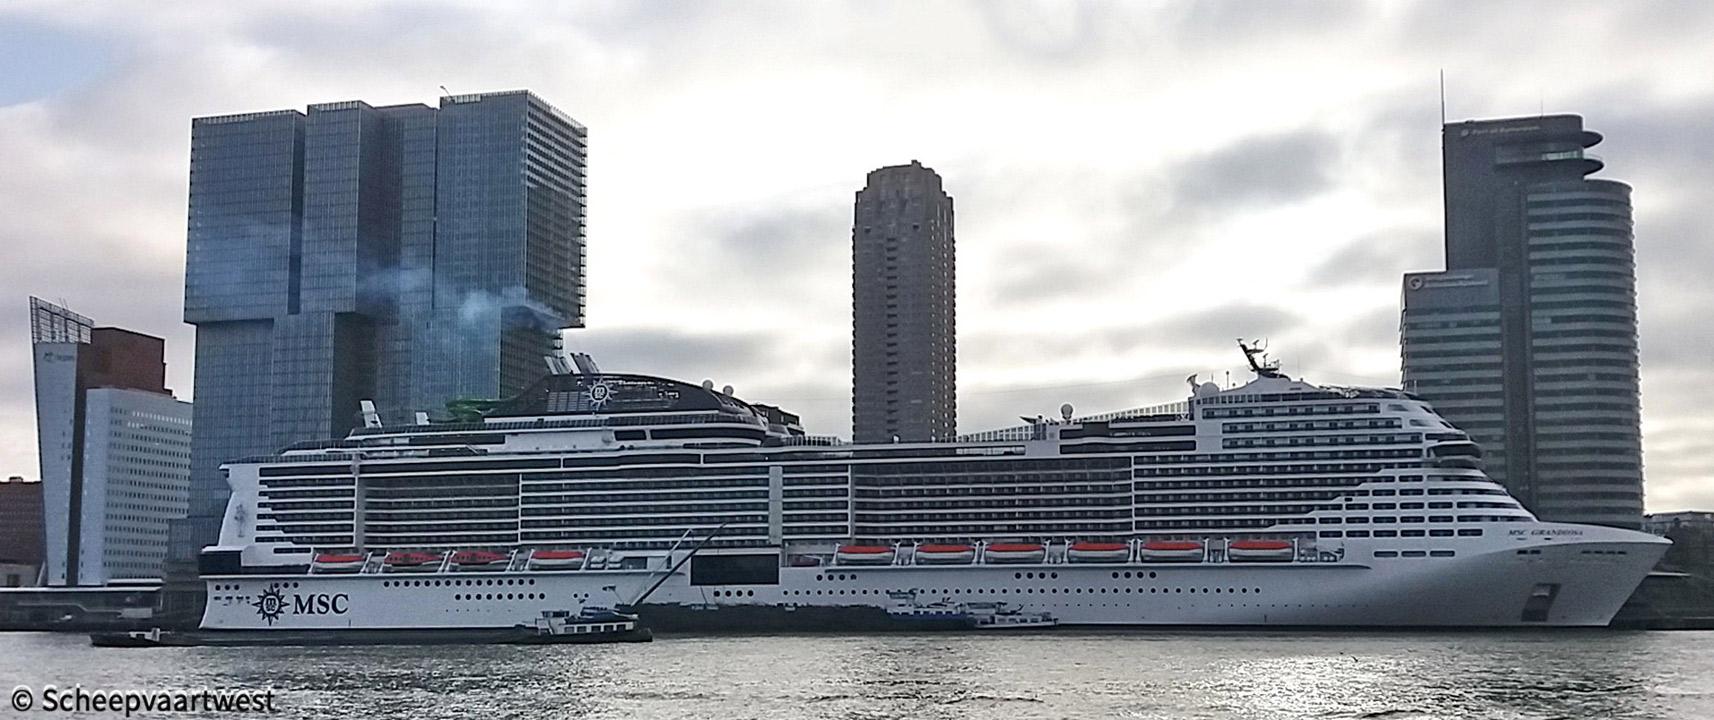 scheepvaartwest - MSC Grandiosa - IMO 9803613